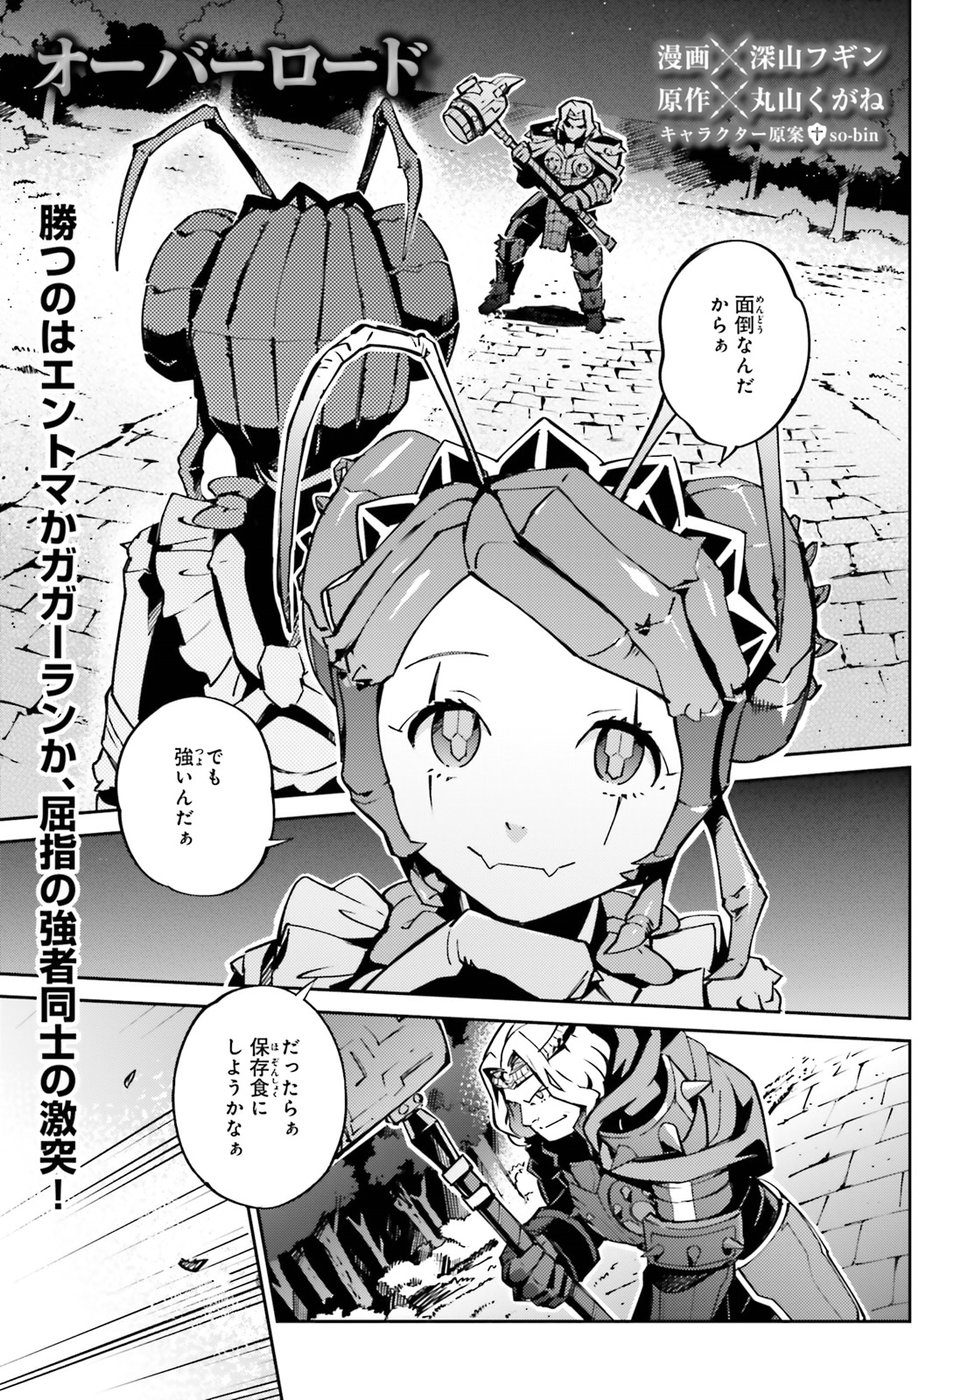 Overlord Manga Chapter 45